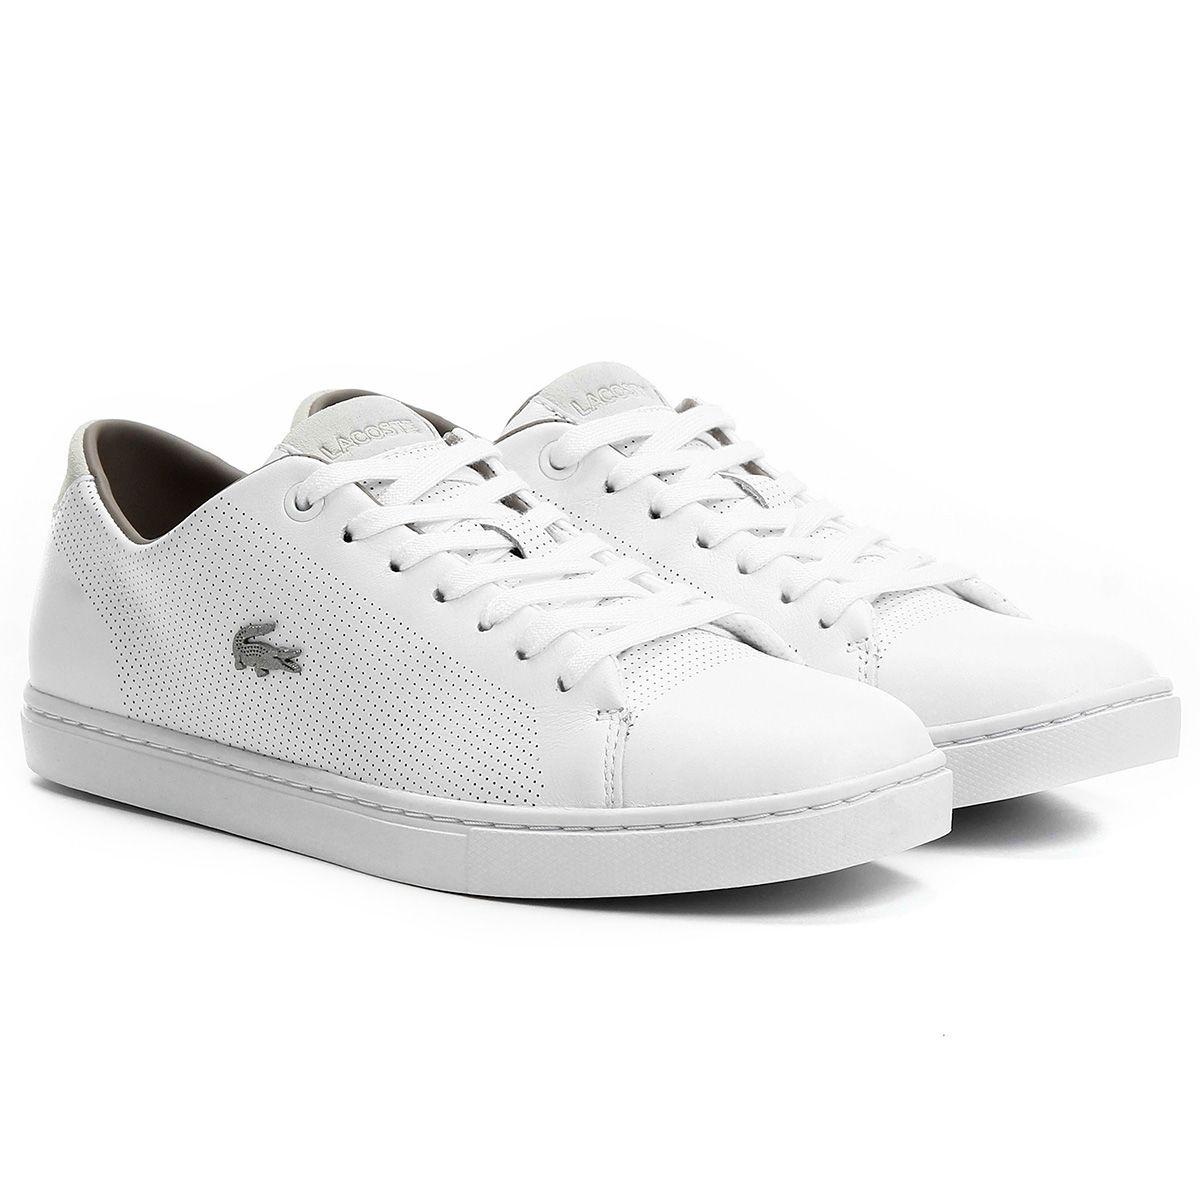 b447fd8deab35 Compre Tênis Lacoste Q3 Showcourt S Branco na Zattini a nova loja de moda…